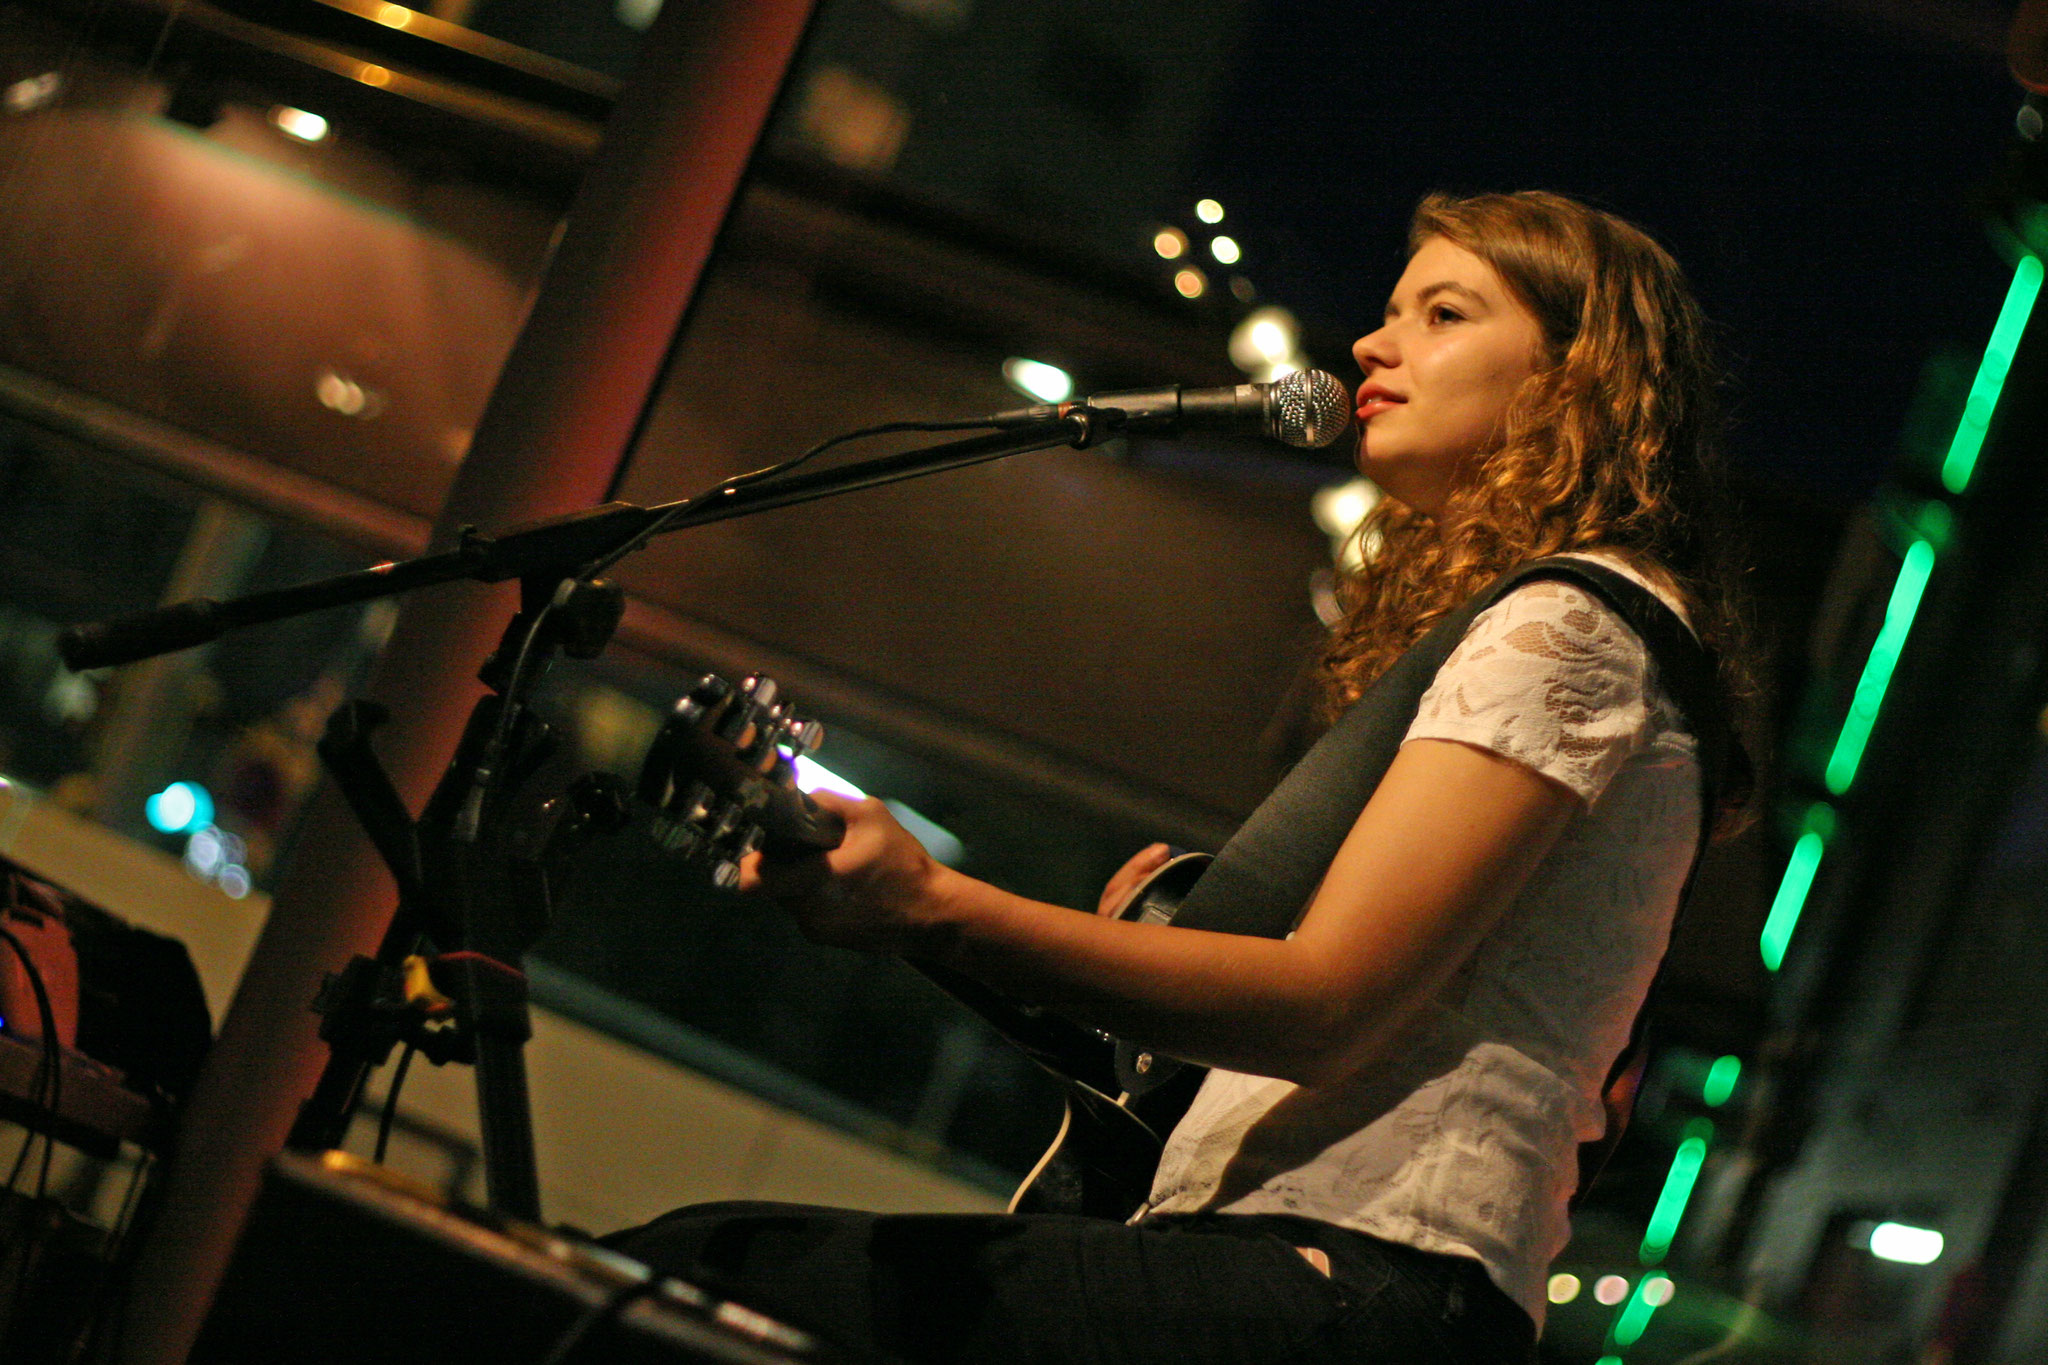 Ines Perndorfer @ Addicted To Rock, 22.09. (c) miggl.at